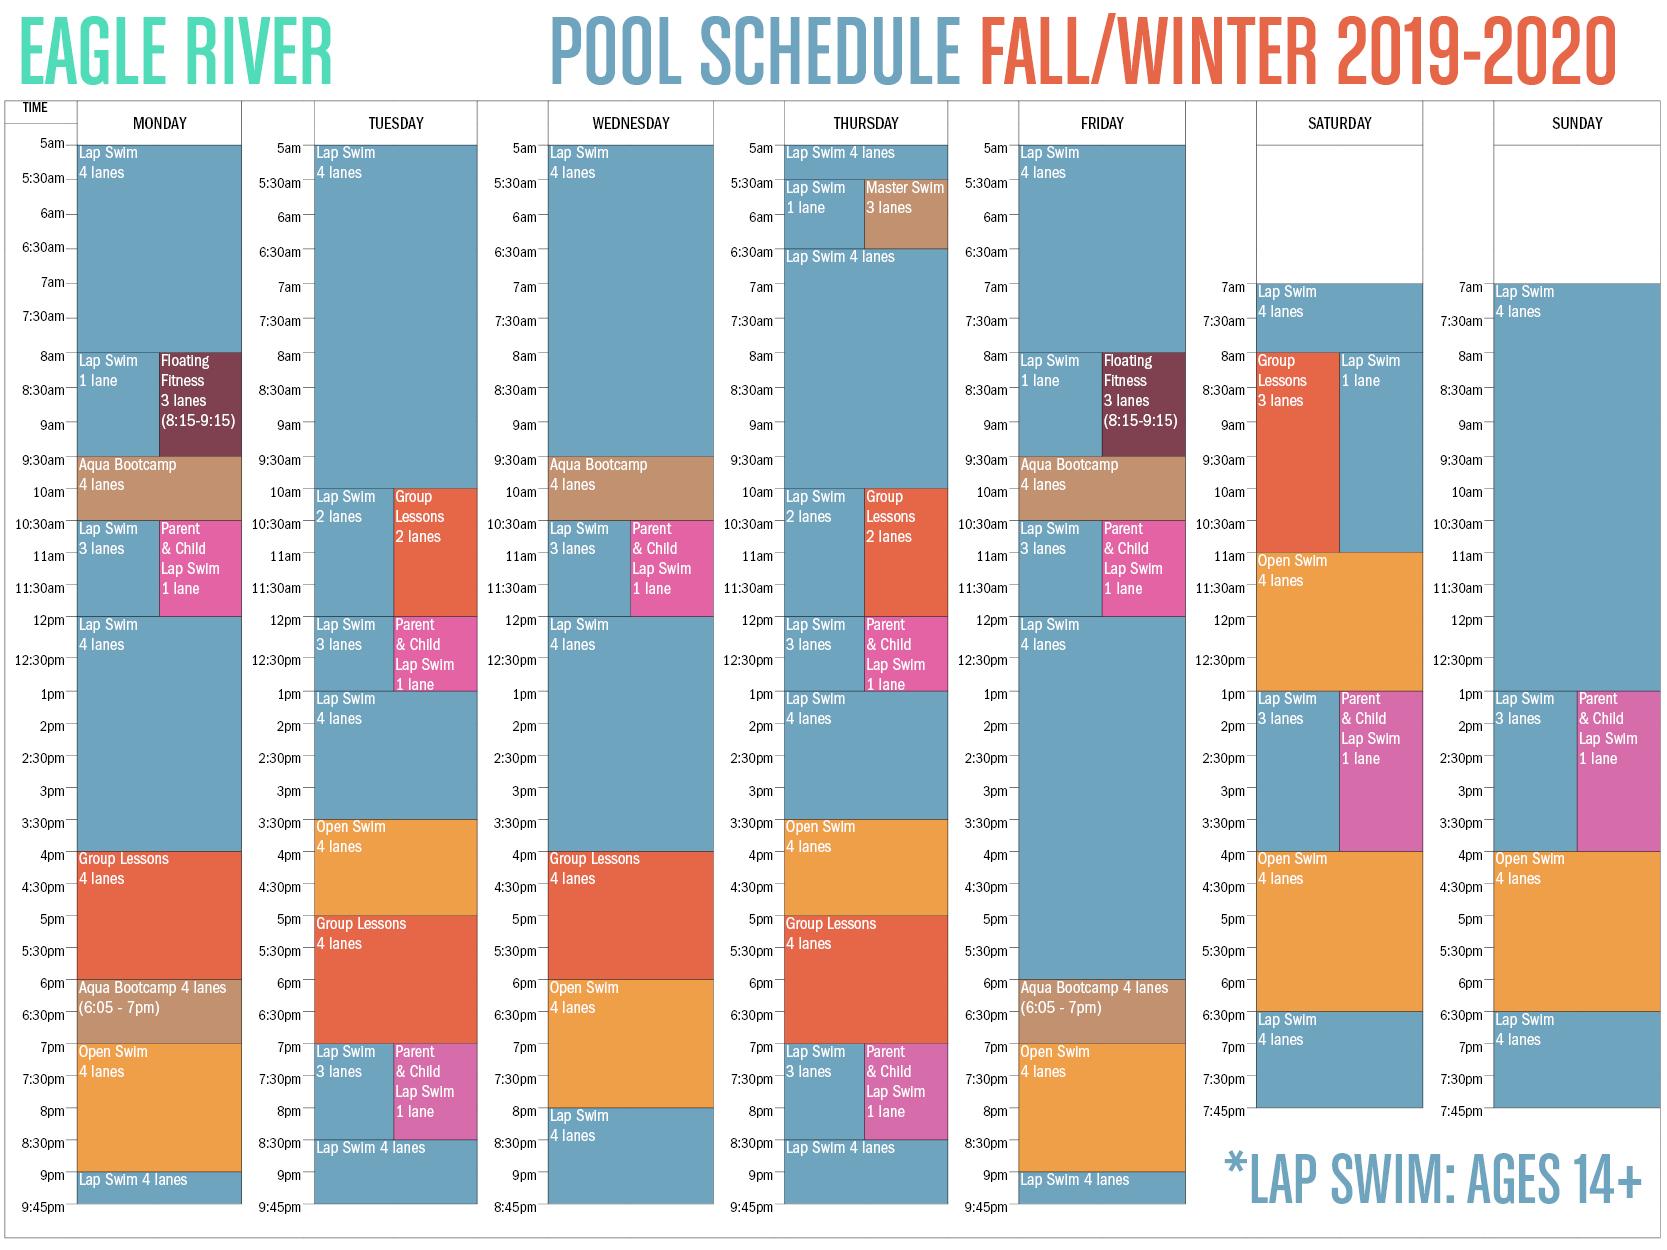 Q4-Q1 Fall-Winter Eagle River Pool Schedule [WEB]